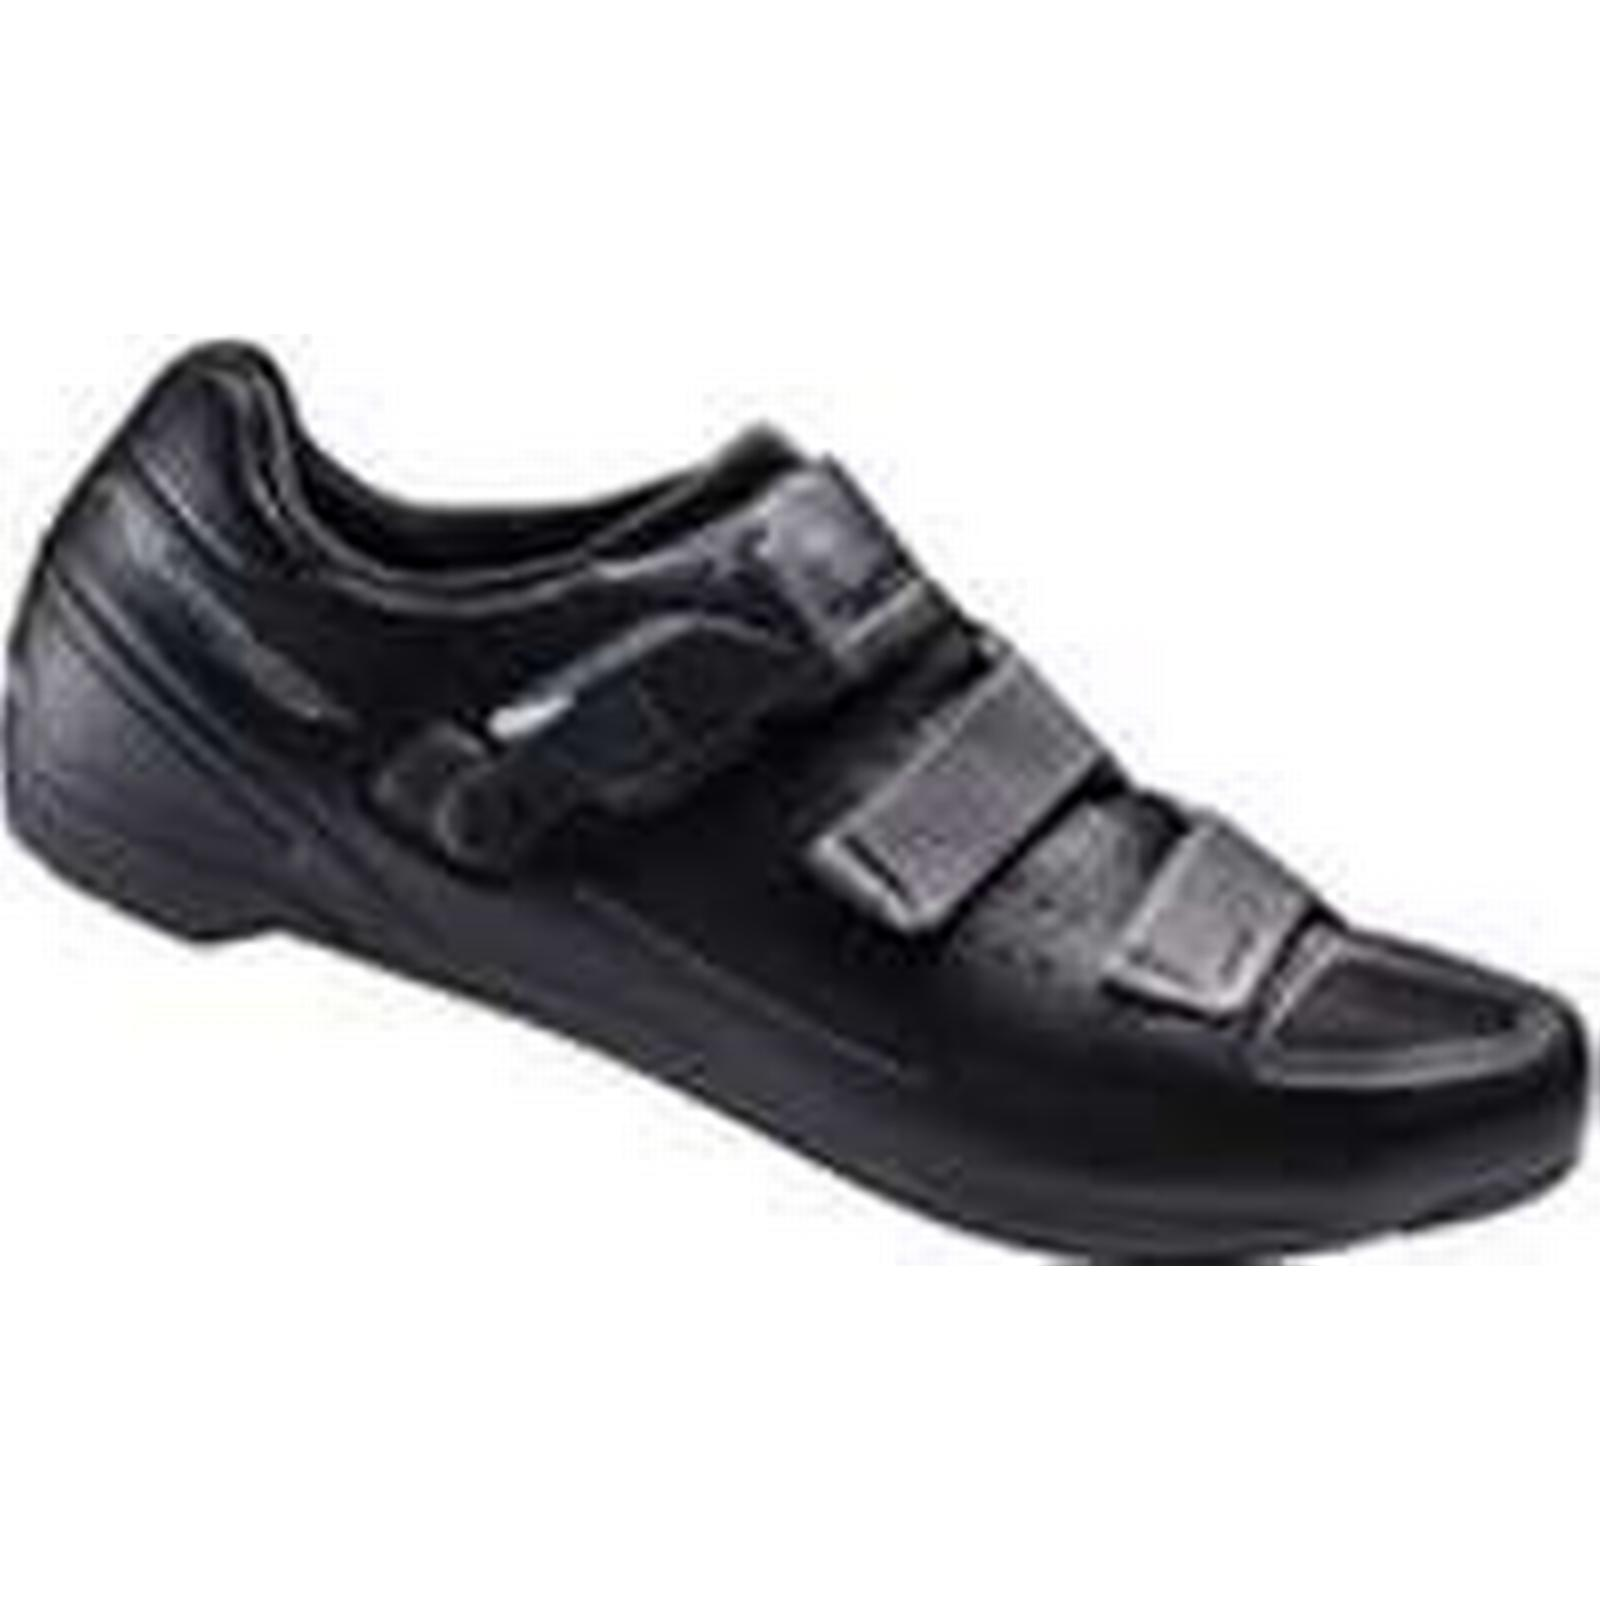 Shimano RP5 SPD-SL Cycling EUR Shoes - Black - EUR Cycling 47 - Black b12573